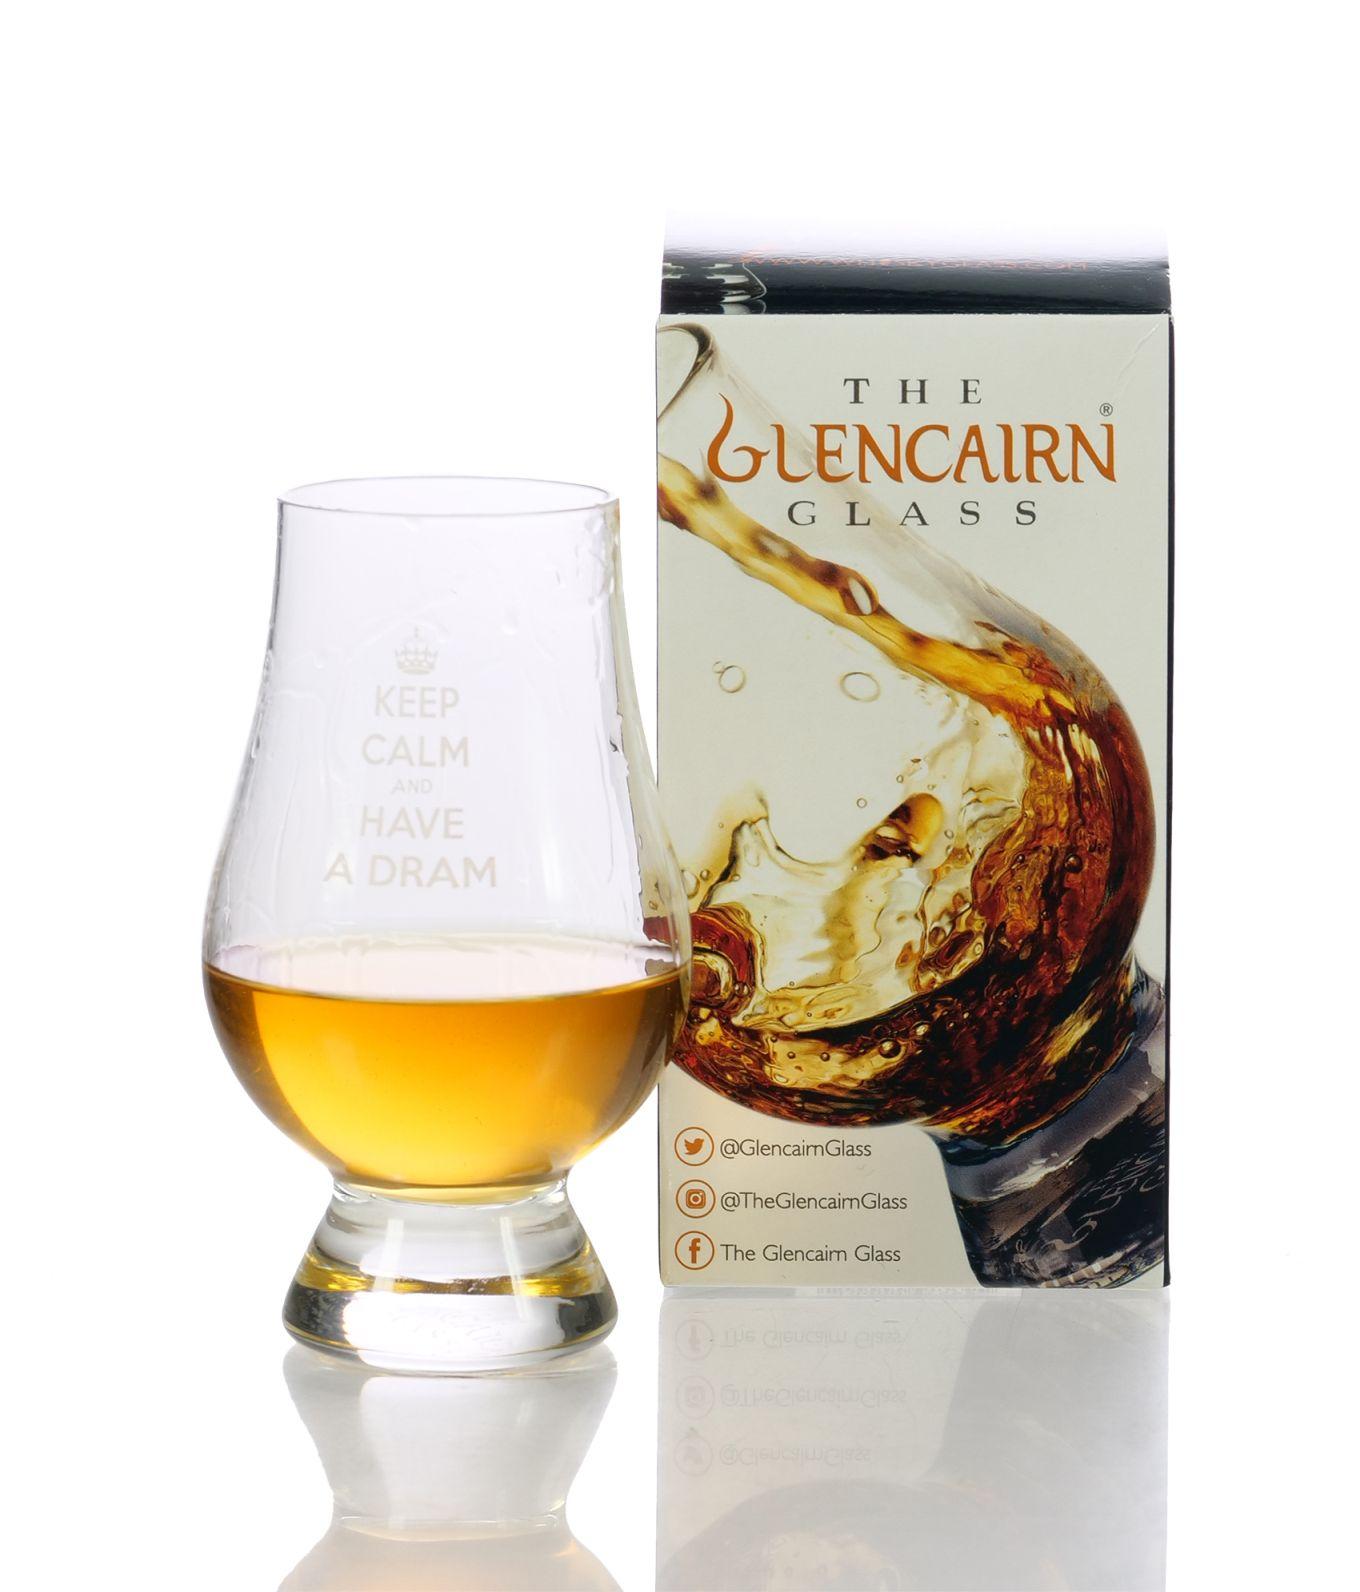 Glencairn Glas Keep Calm and have a dram